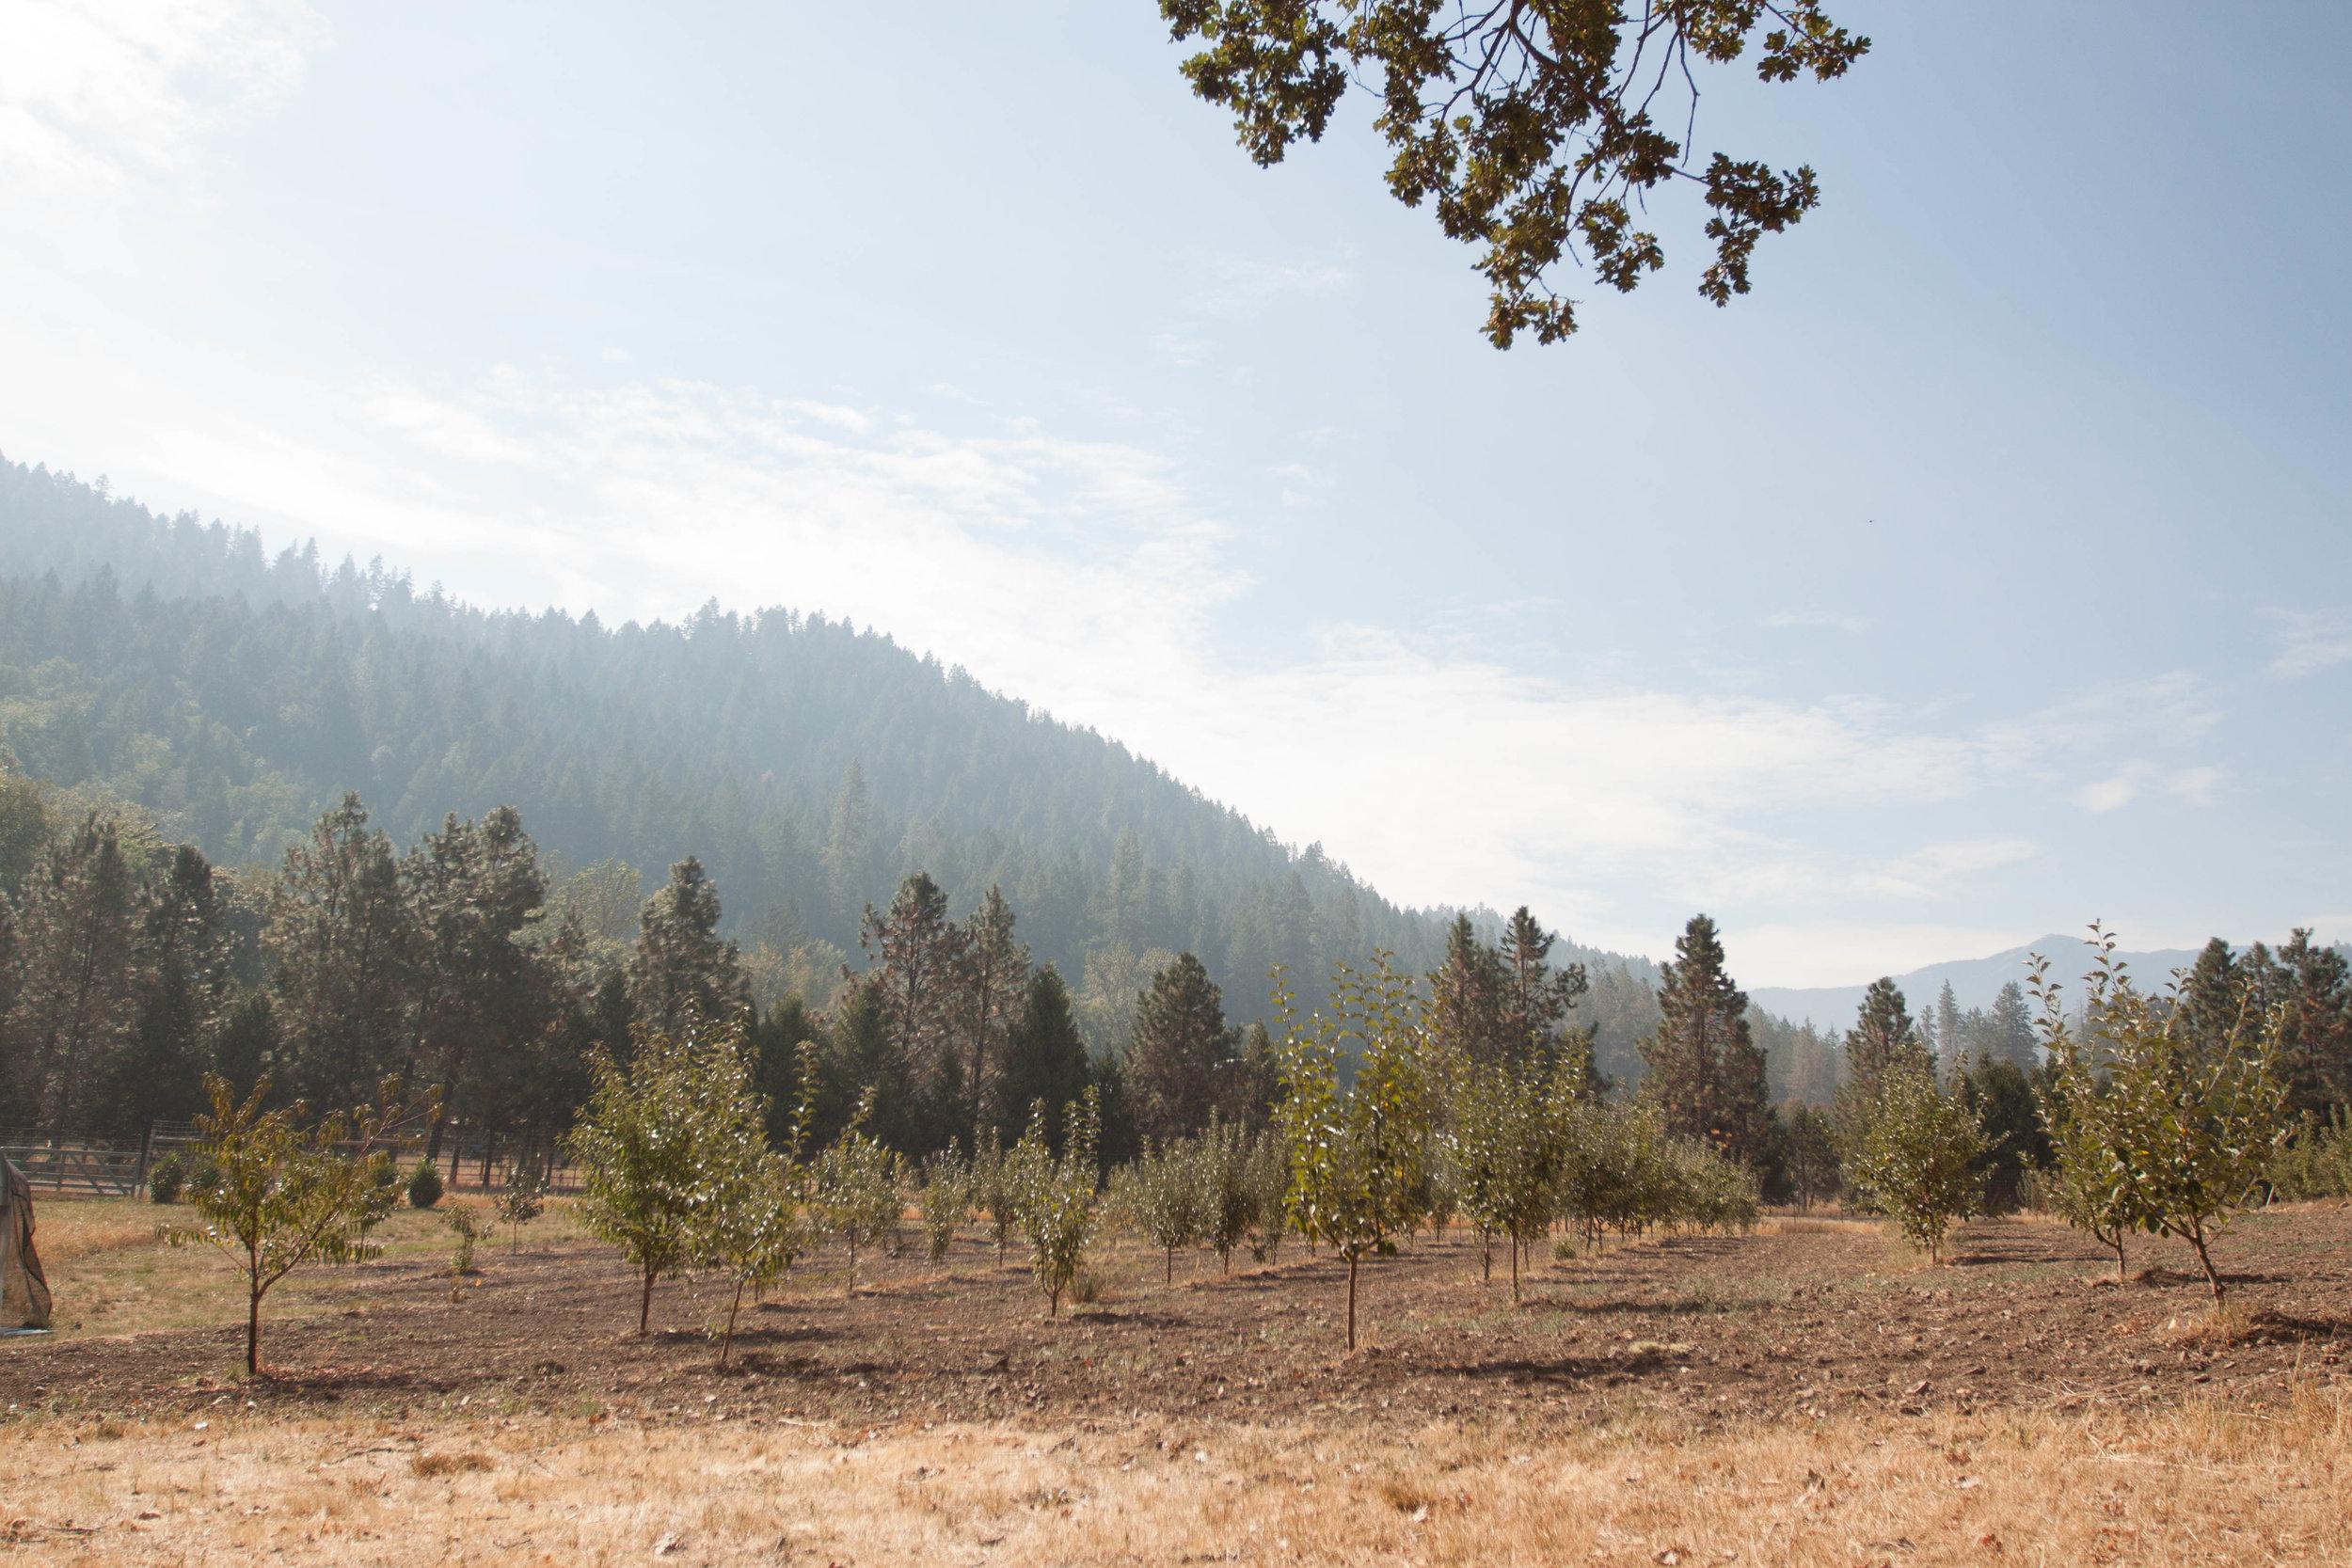 Ridgefield Meadows Farm in Oregon [photo by: Olivia Guethling]